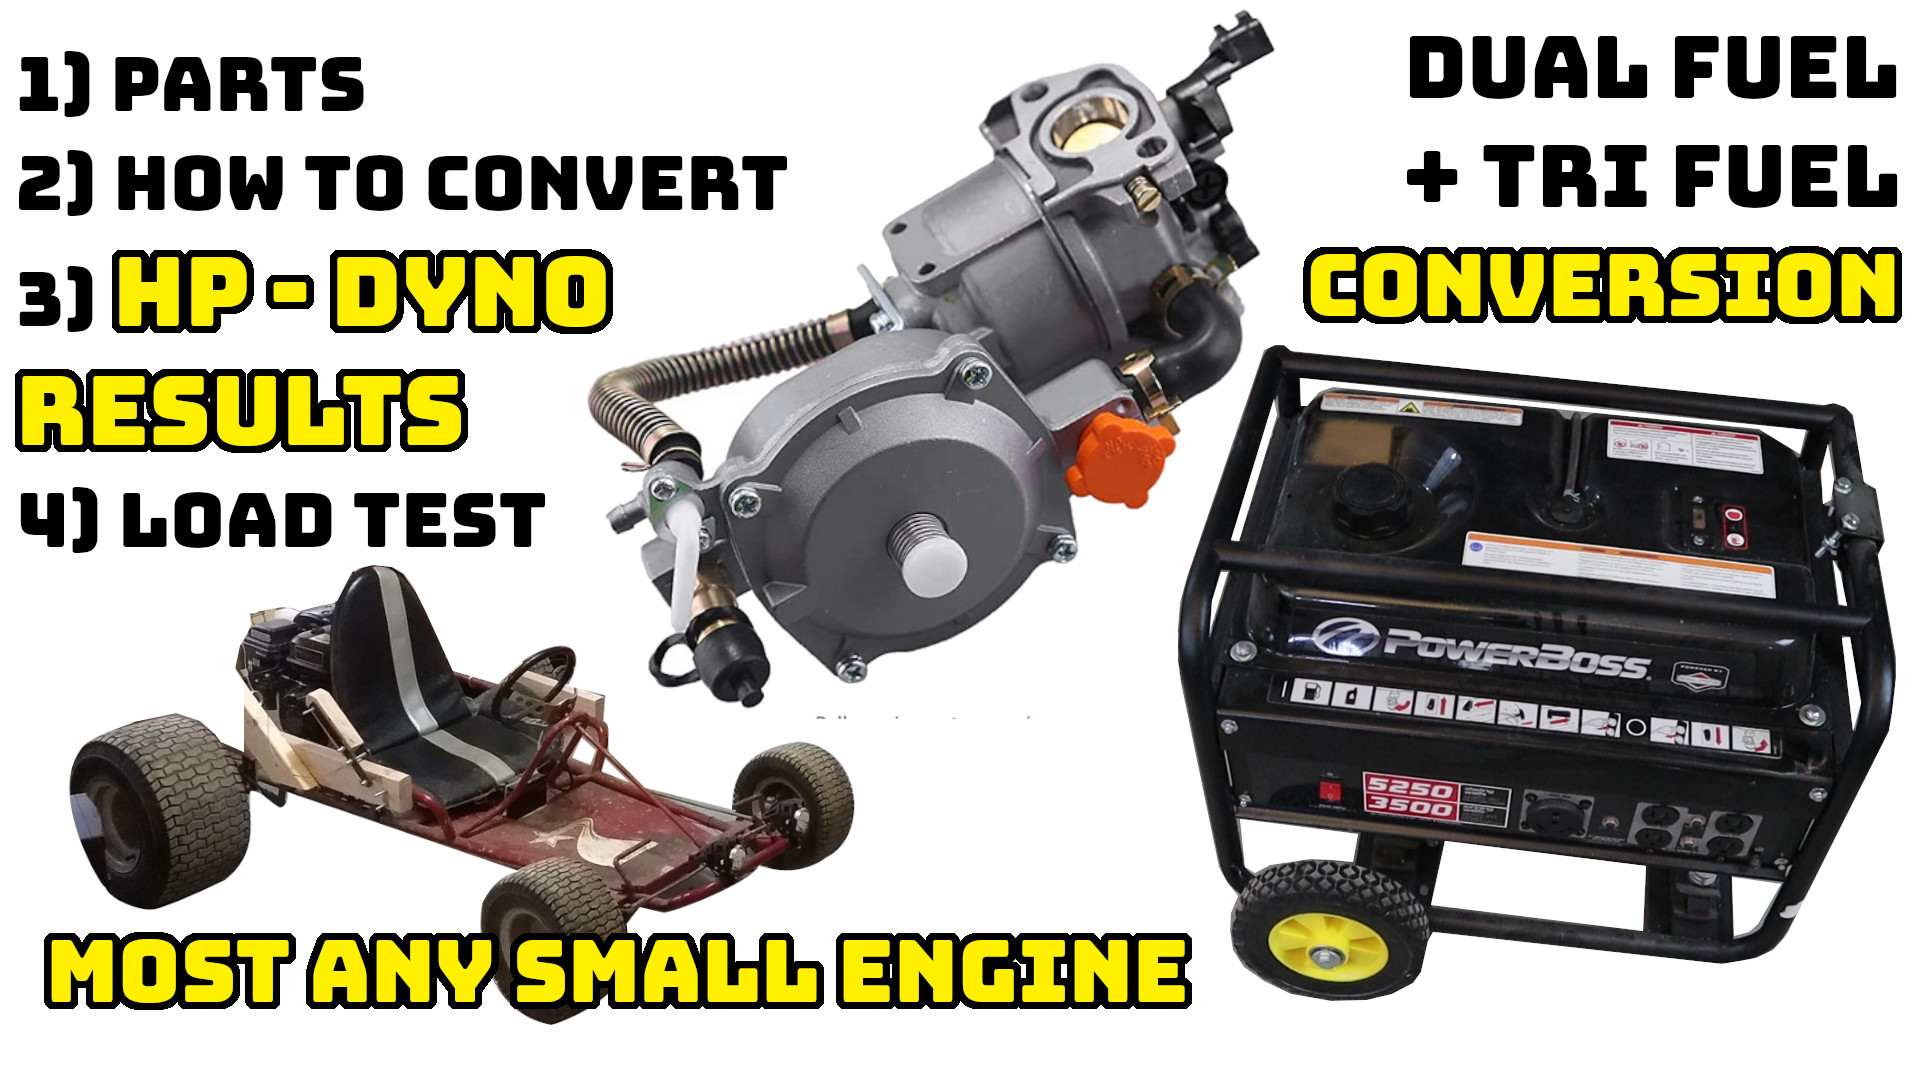 Dual fuel / Tri fuel carburetor conversion for small engines